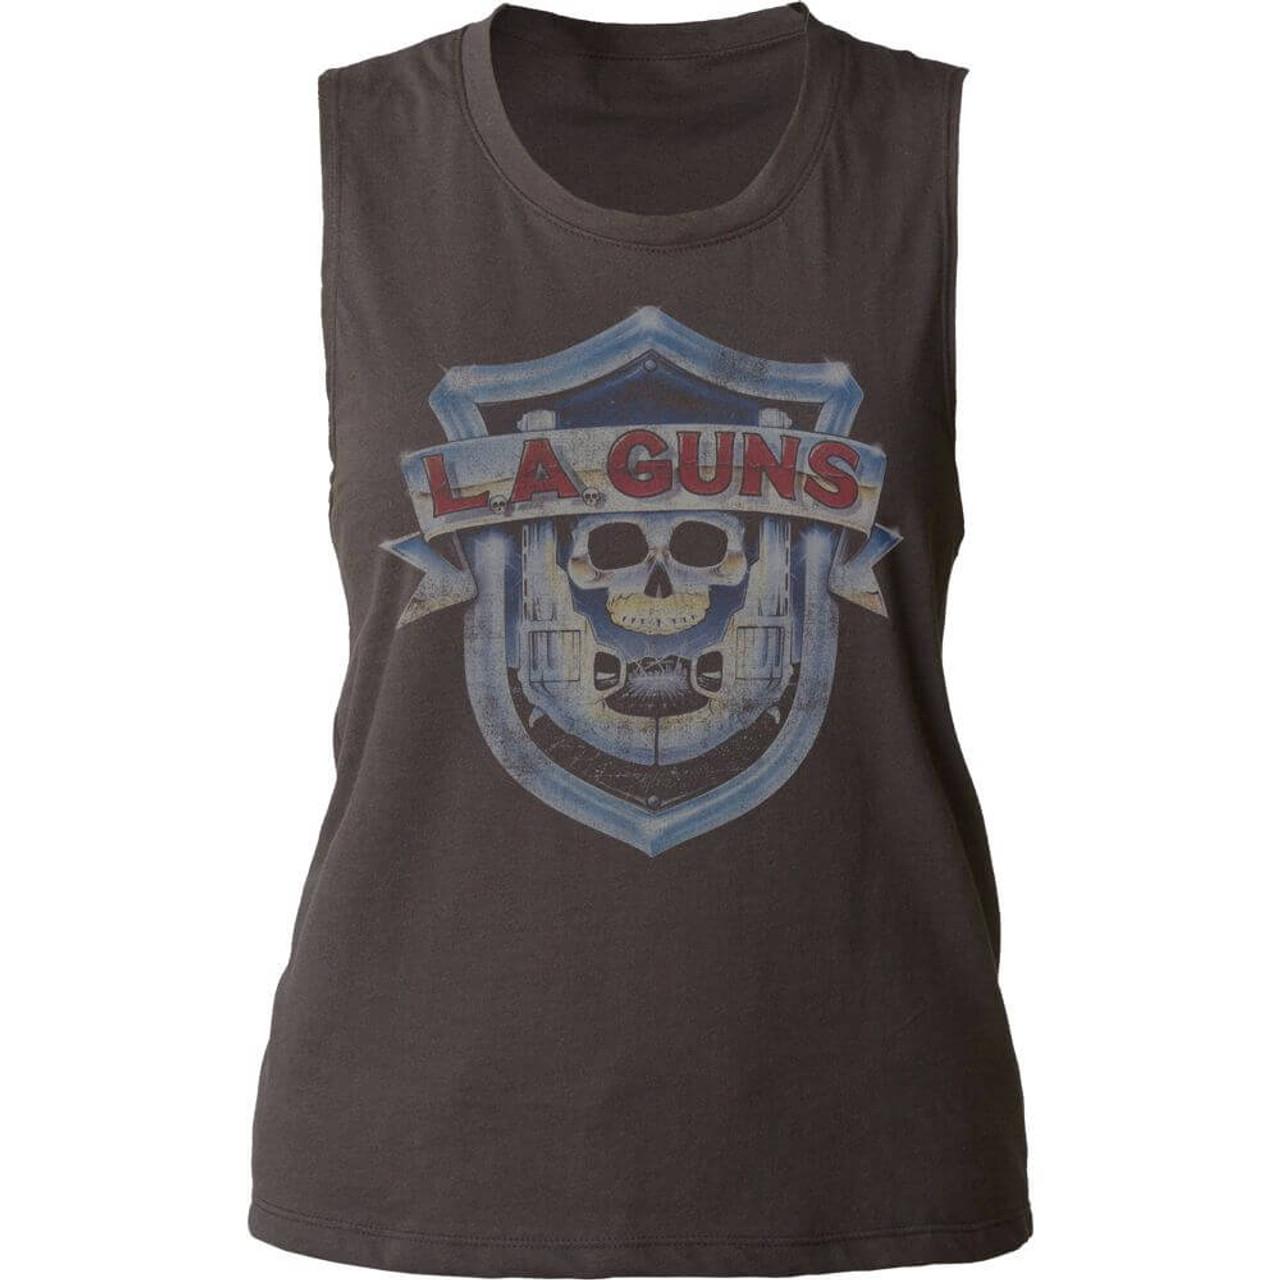 e78d95885d4a8e LA Guns Logo and Debut Album Cover Artwork Women s Black Vintage Sleeveless  T-shirt